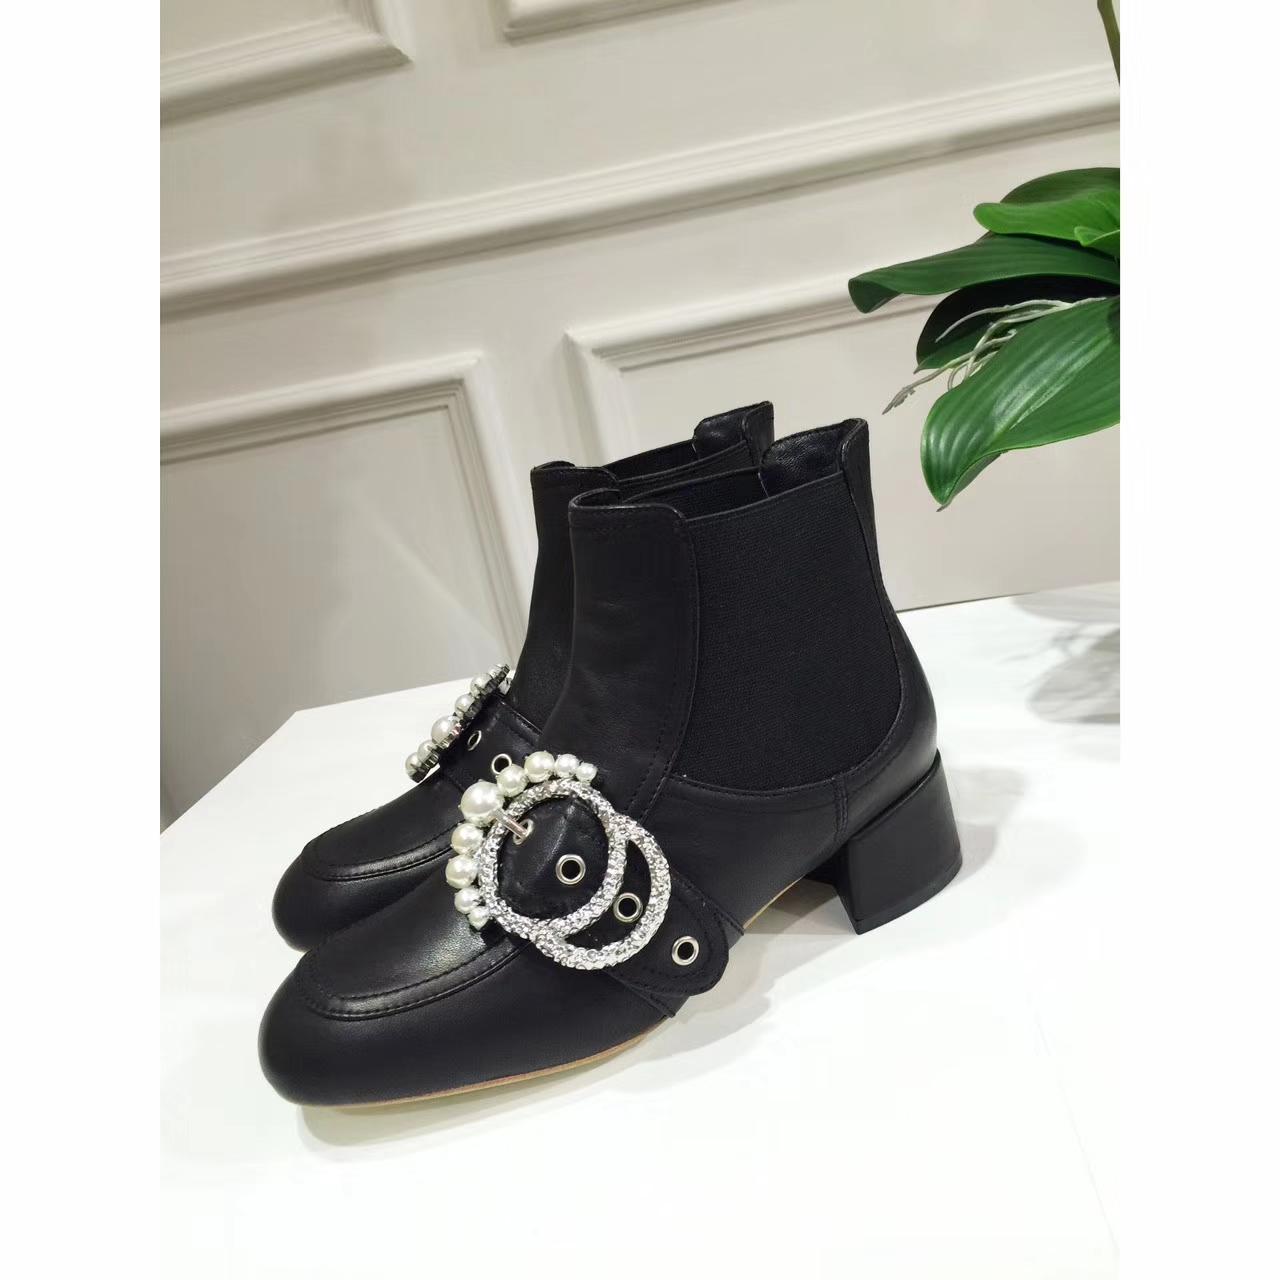 Miumiu女靴 秋冬新款珍珠短靴